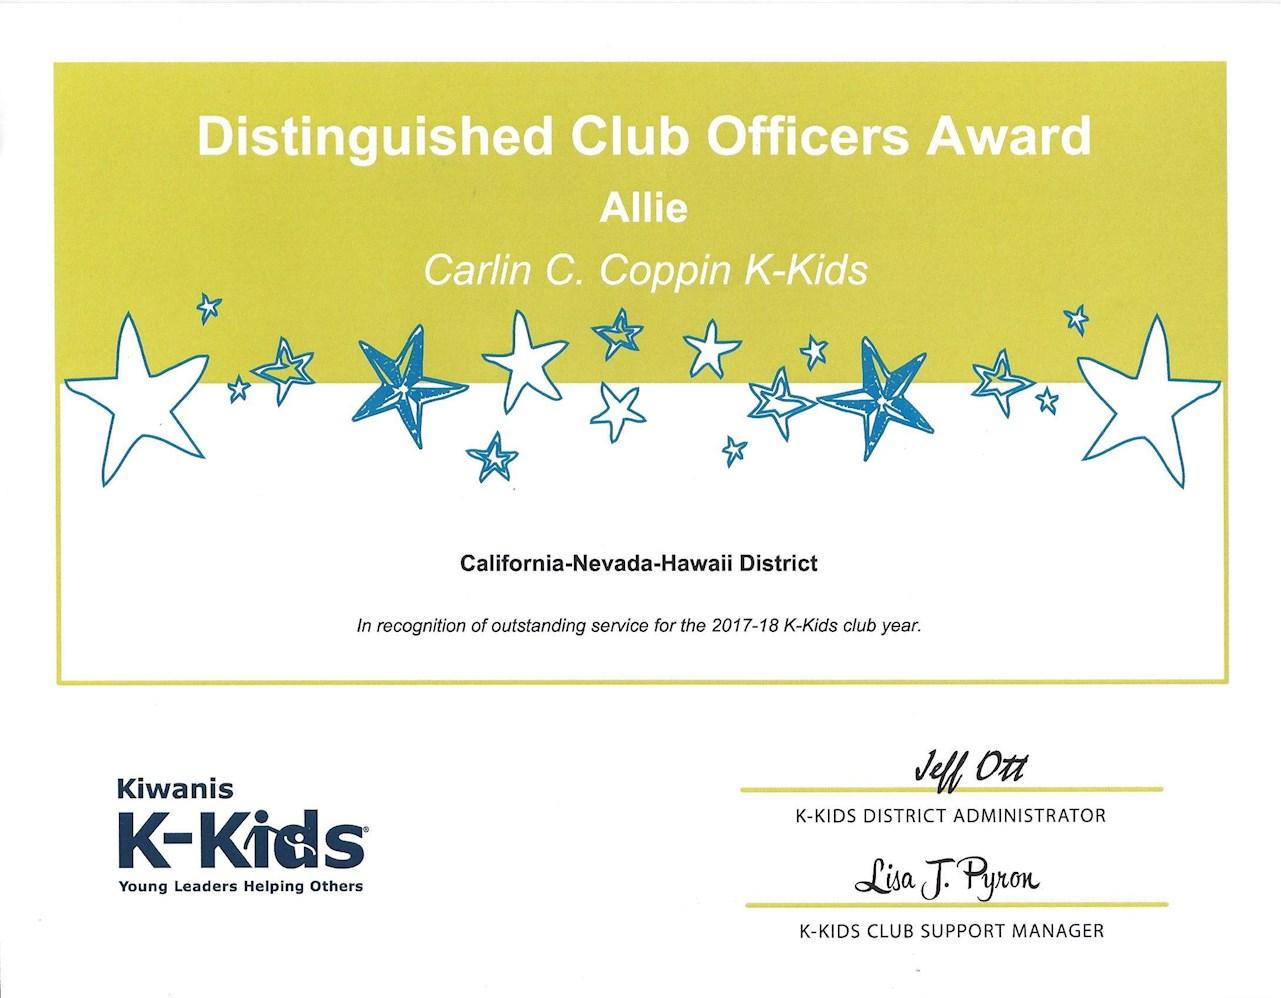 Kiwanis Club of Lincoln Foothills